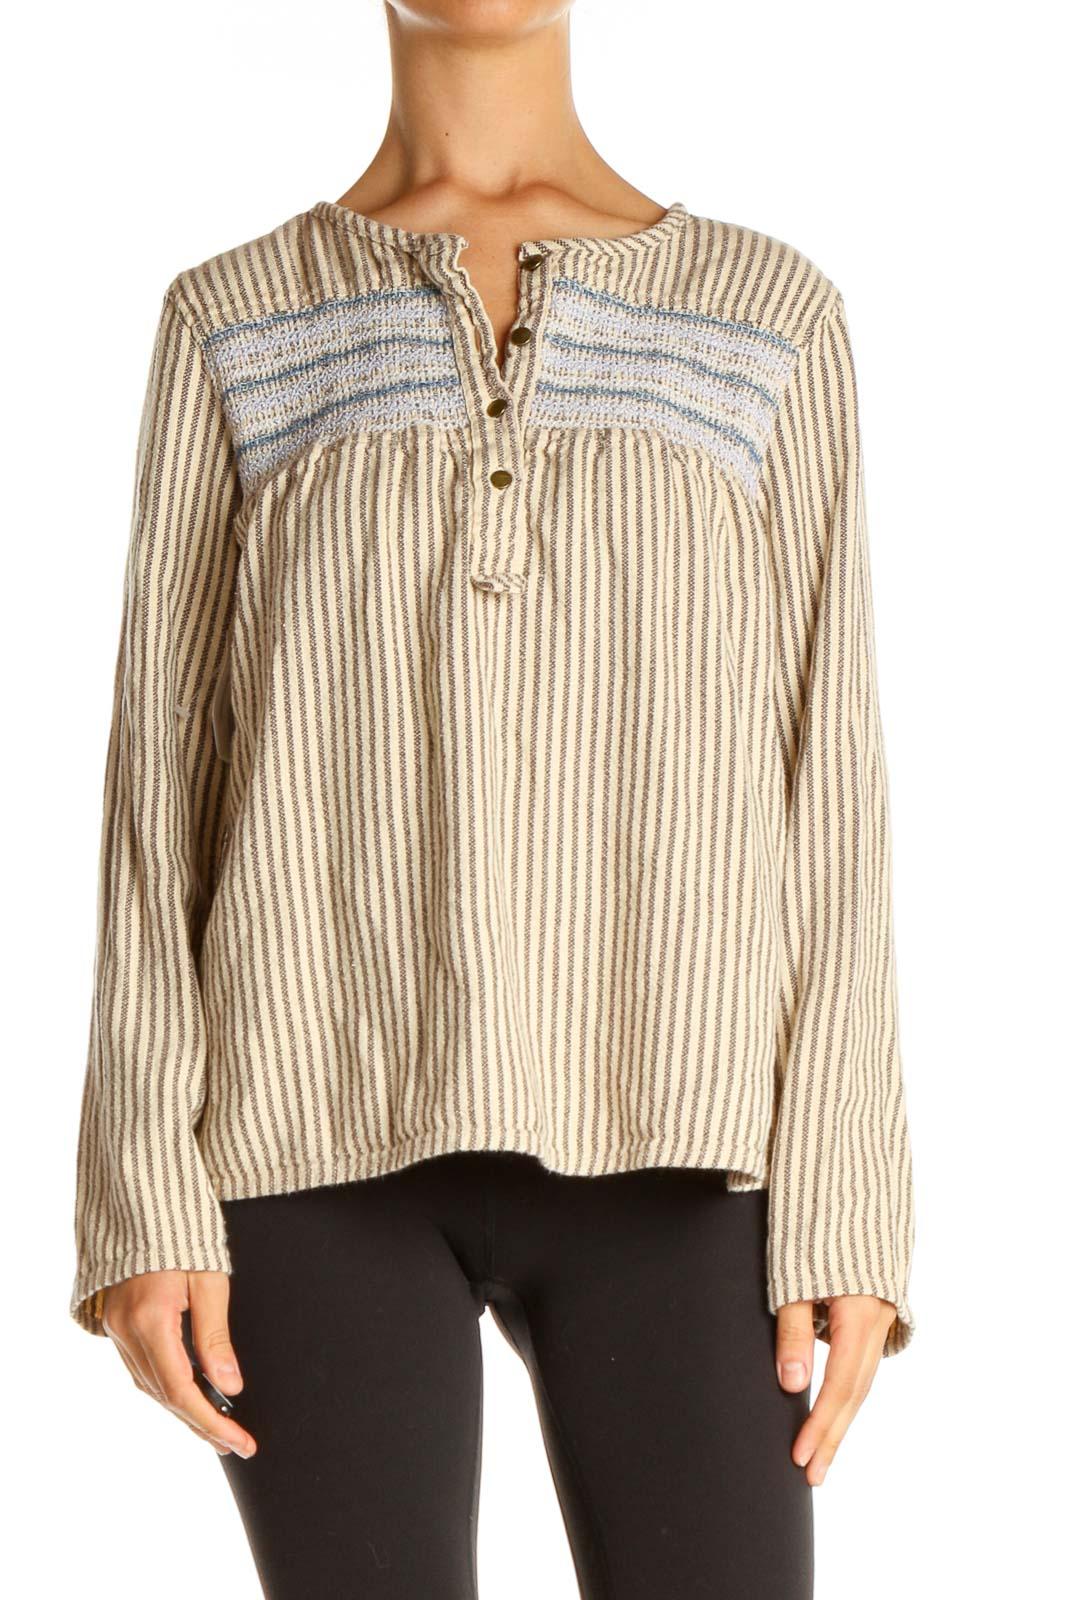 Beige Striped Bohemian Shirt Front